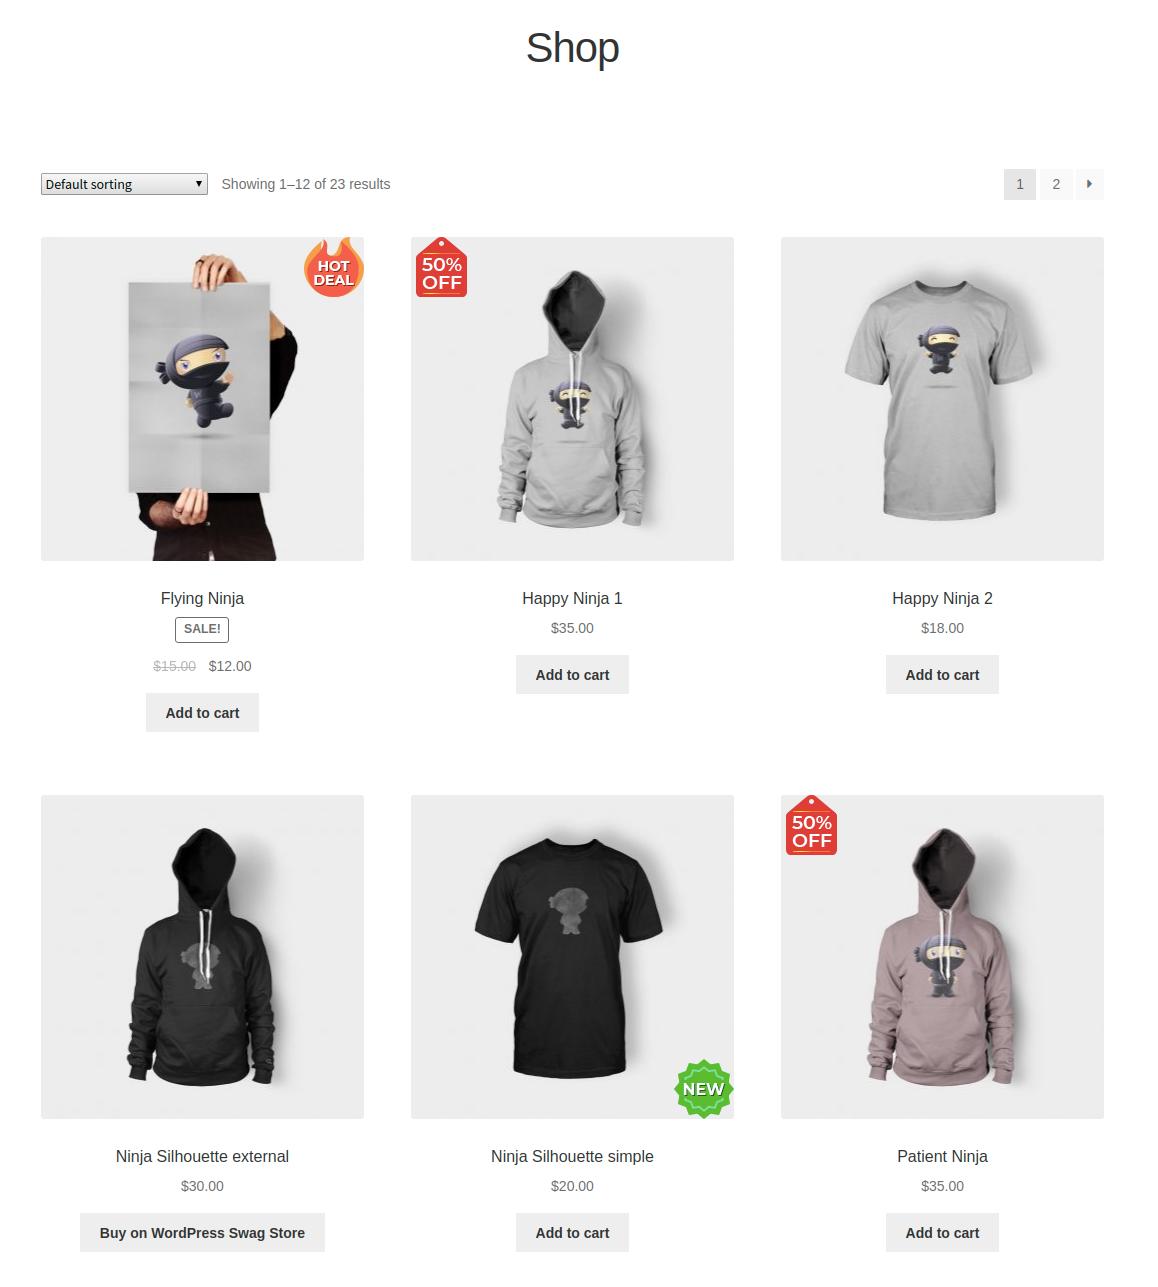 webkul-woocommerce-custom-product-label-visibility-on-shop-page